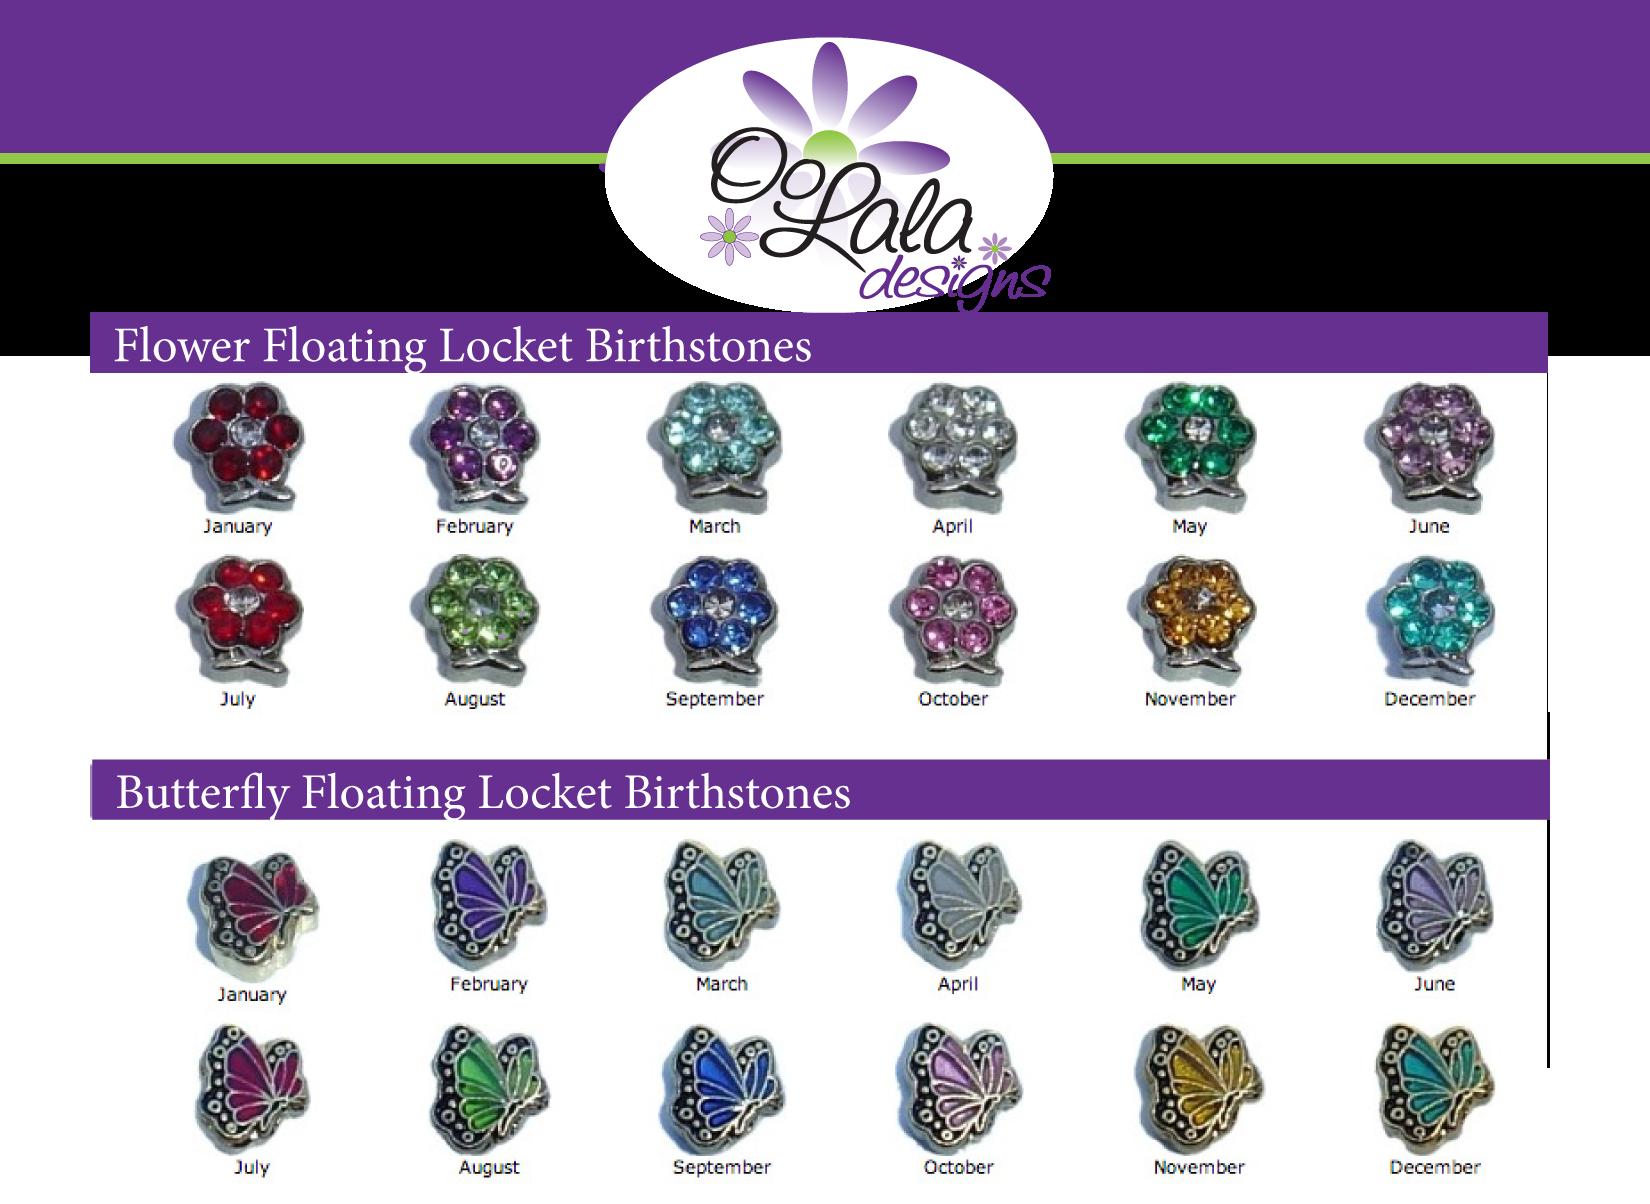 Flowers & Butterfly Birthstones · OoLala Designs · line Store Powered b